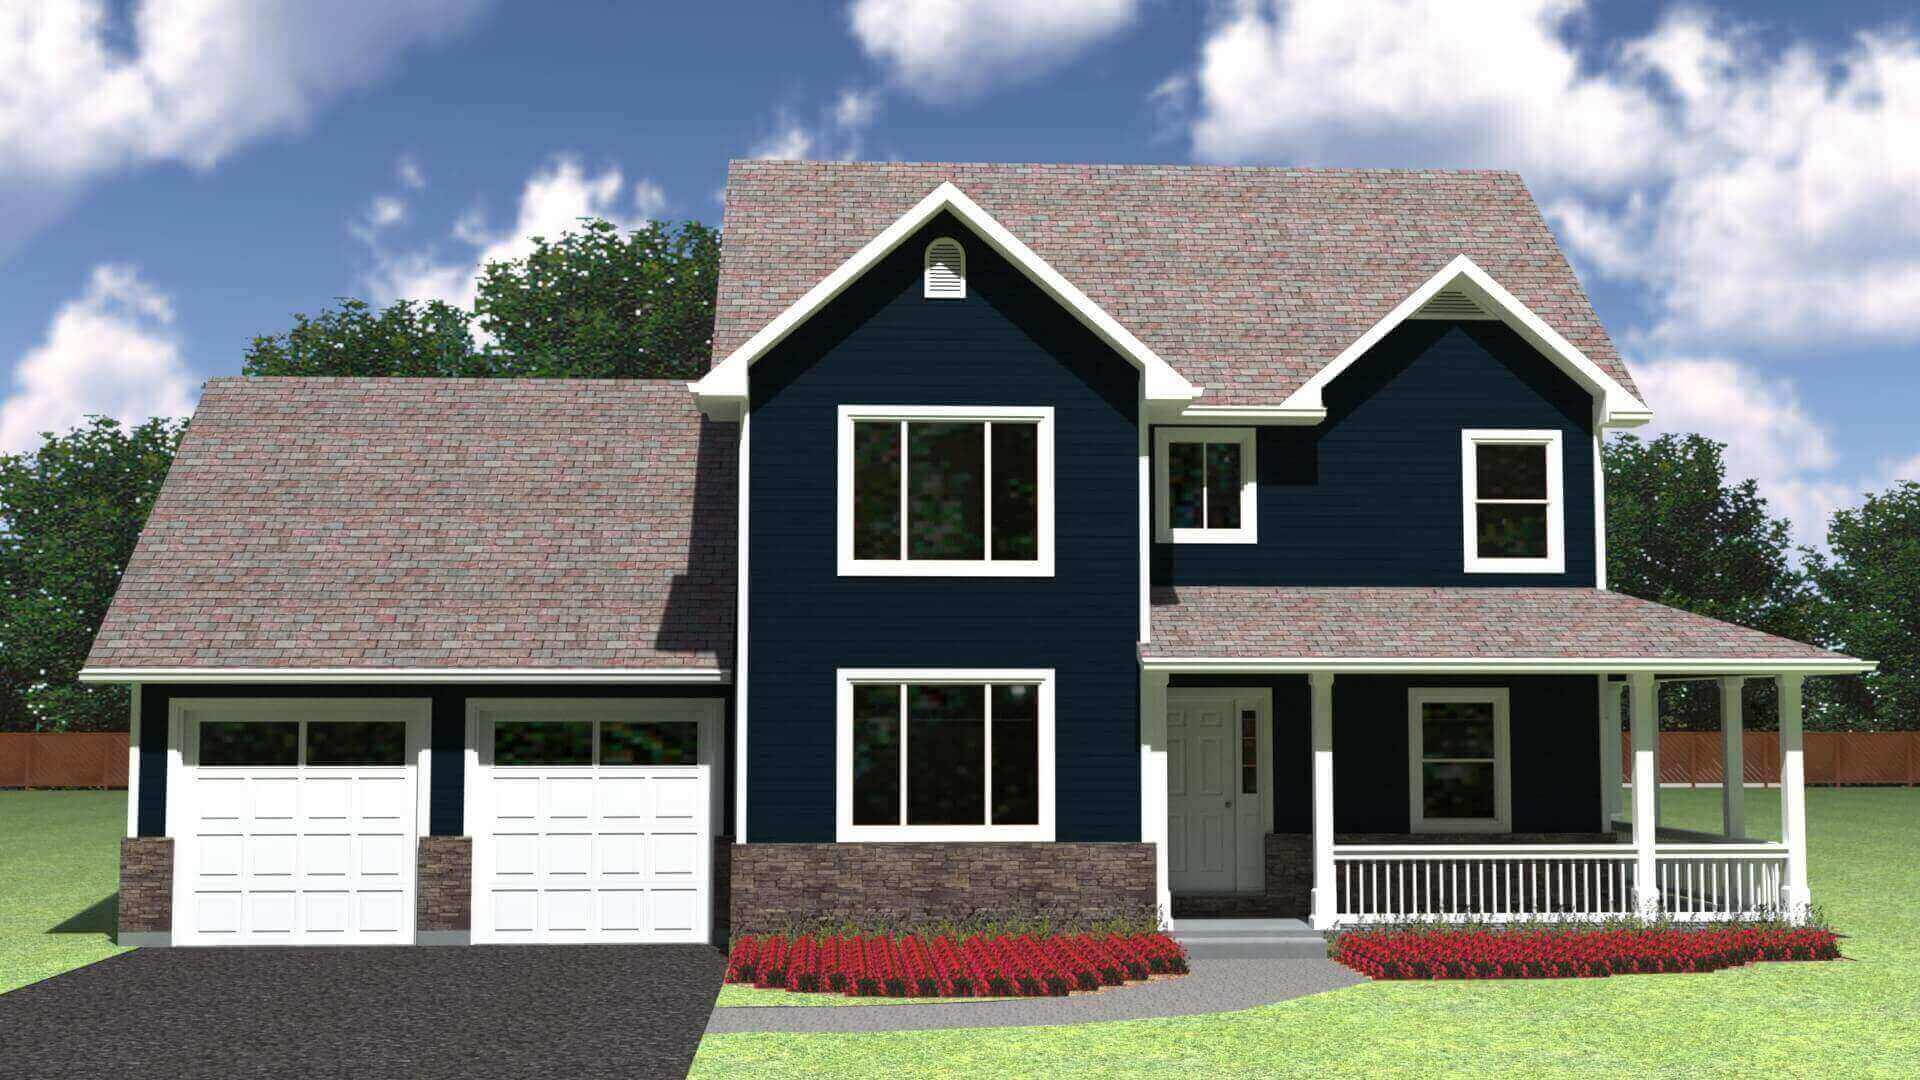 1649 house elevation